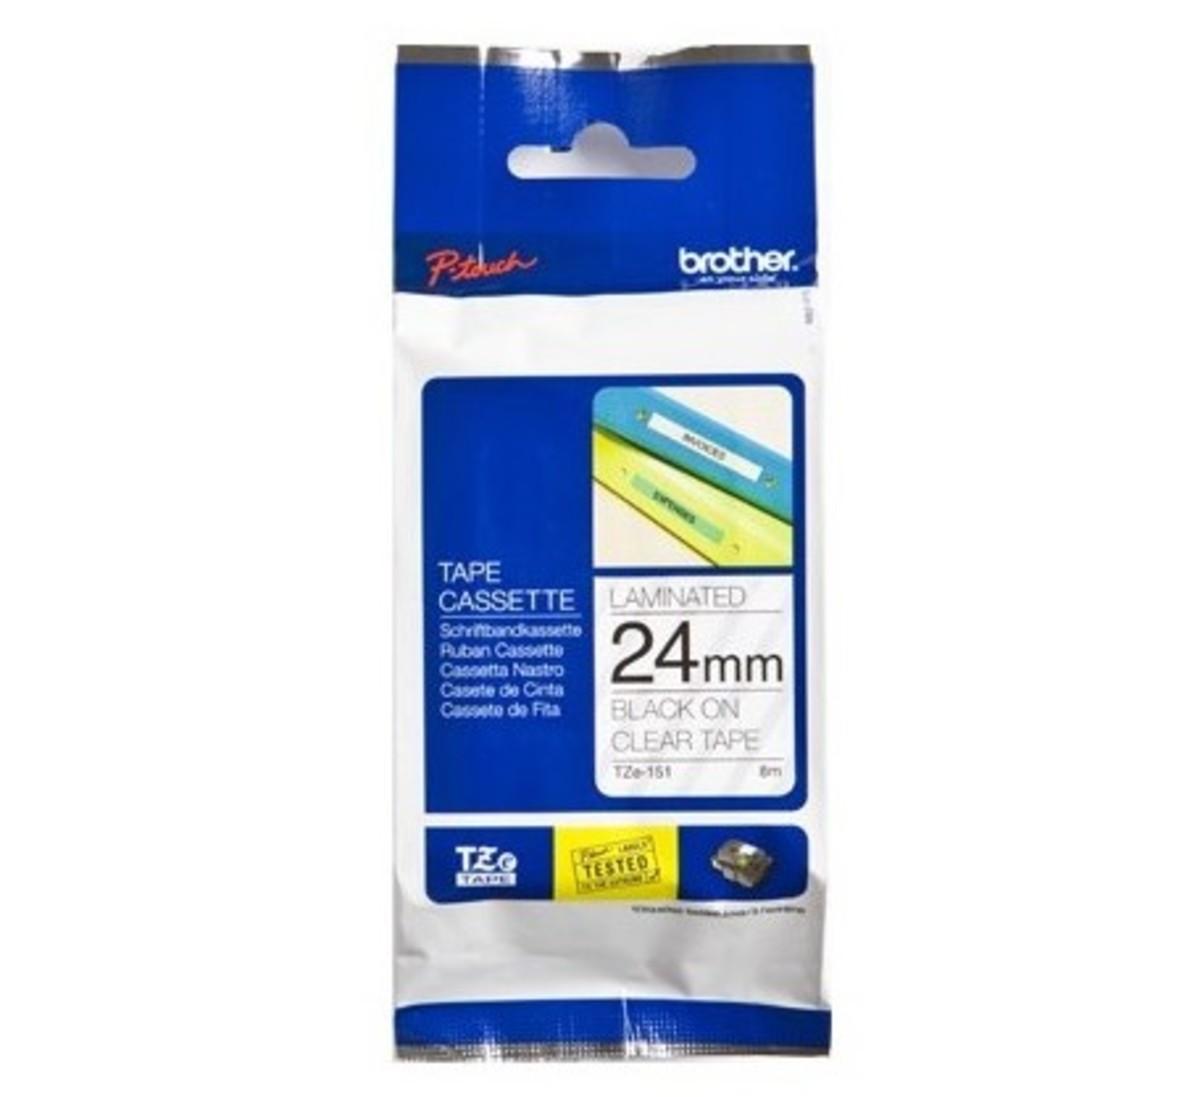 24mm 透明底黑字 TZe-151 過膠保護層標籤帶